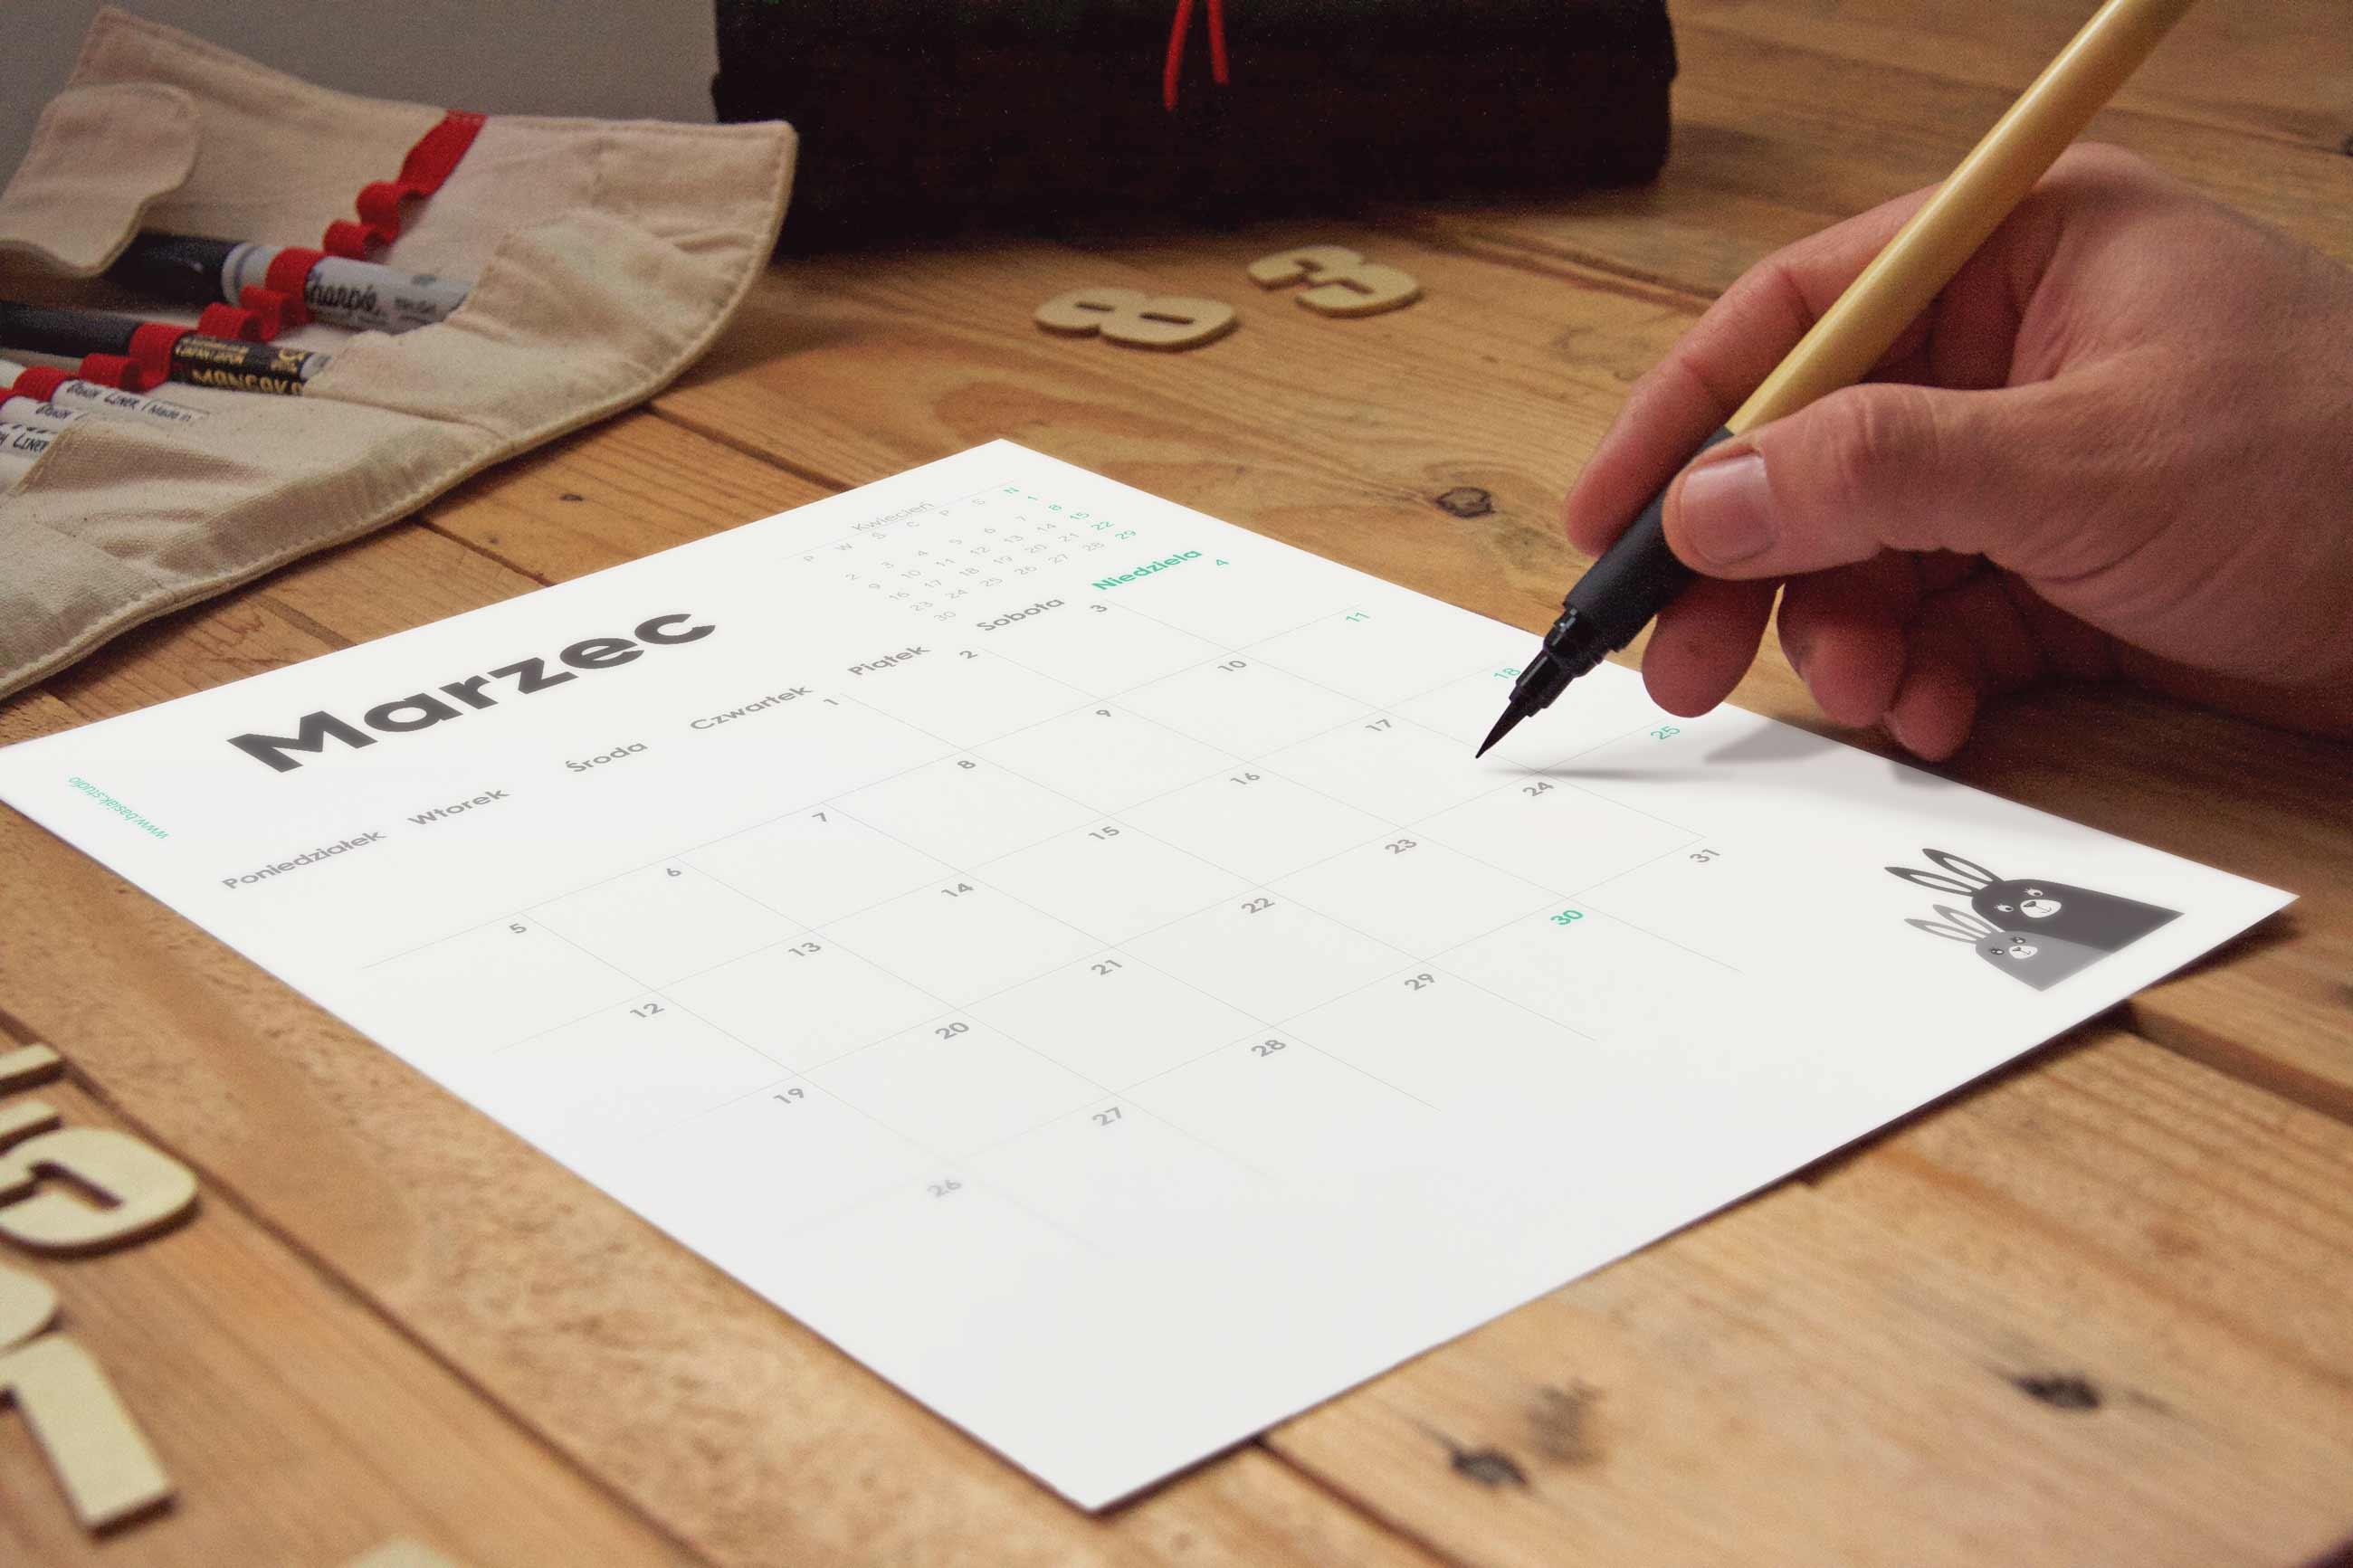 kartka kalendarza do druku